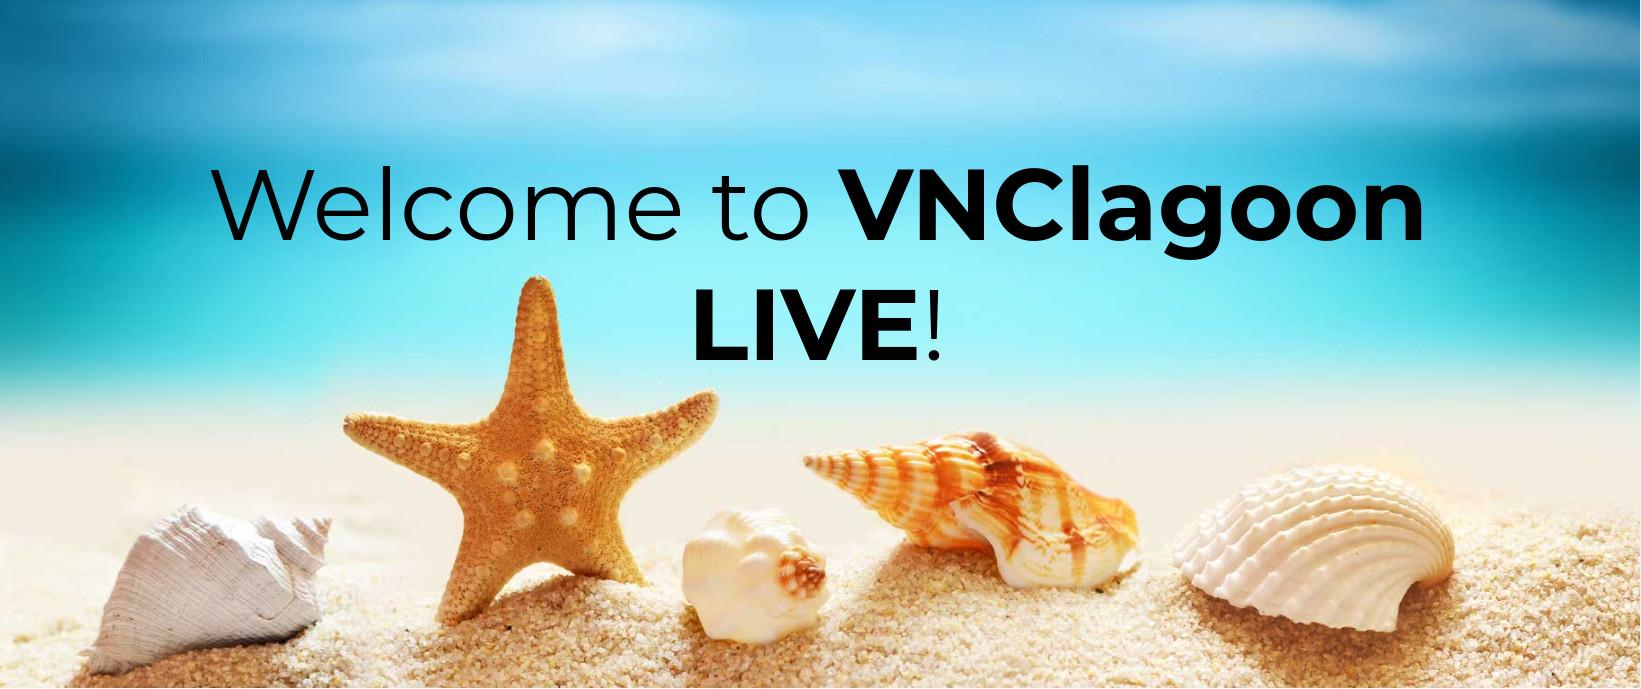 VNClagoon LIVE teaser image